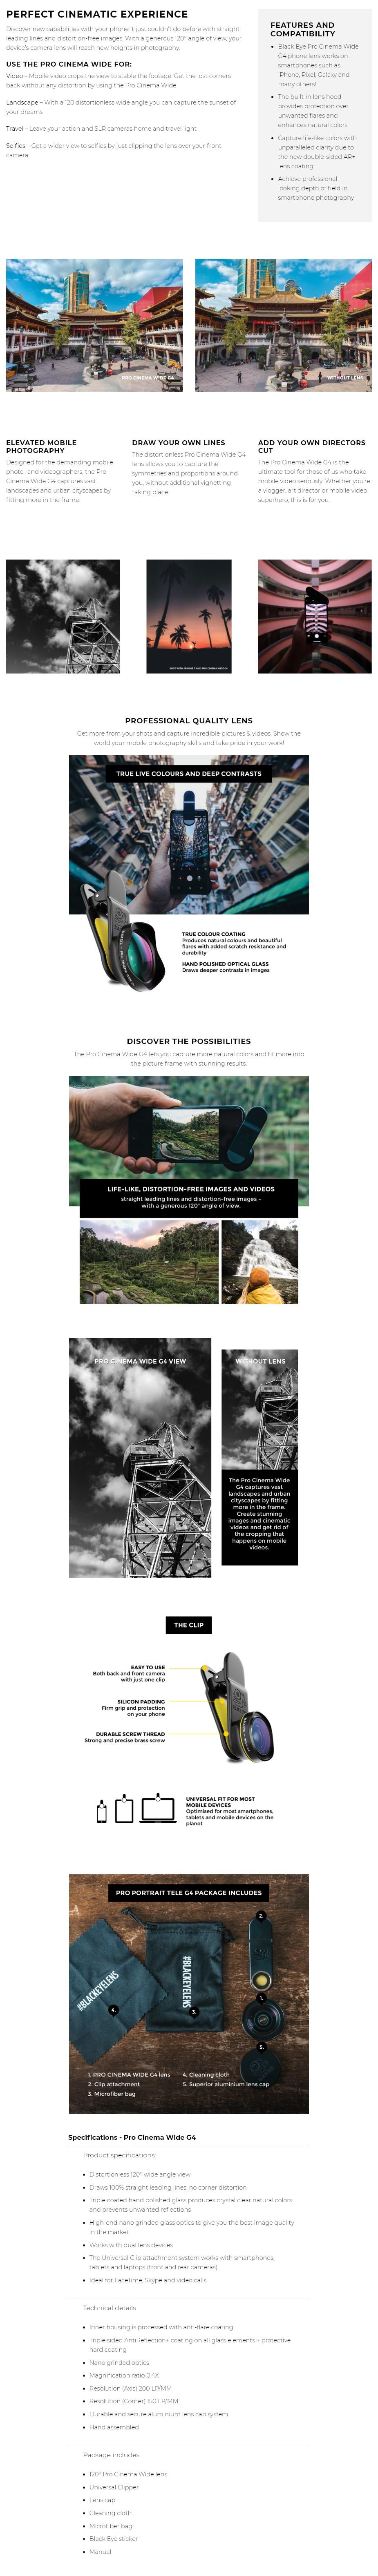 Black Eye PRO Cinema Wide G4 Phone Lens - Overview 1